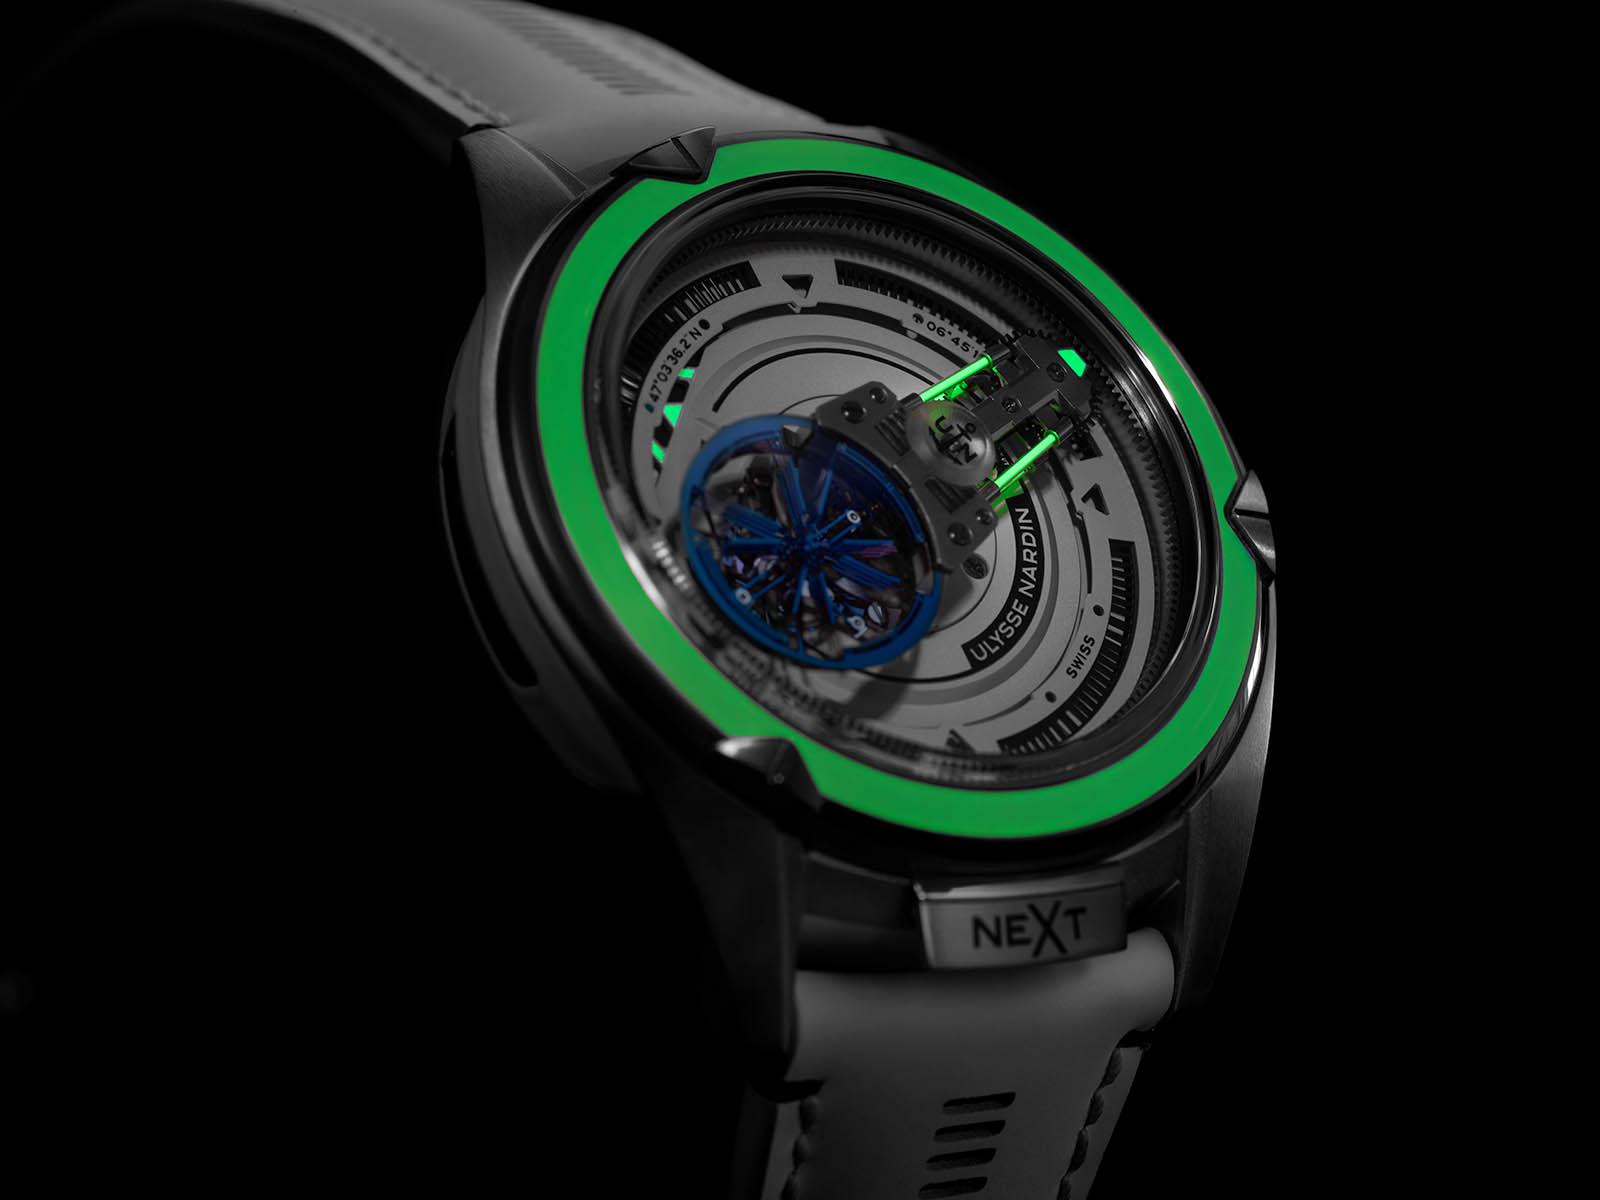 2505-250-00-ulysse-nardin-freak-next-concept-6.jpg